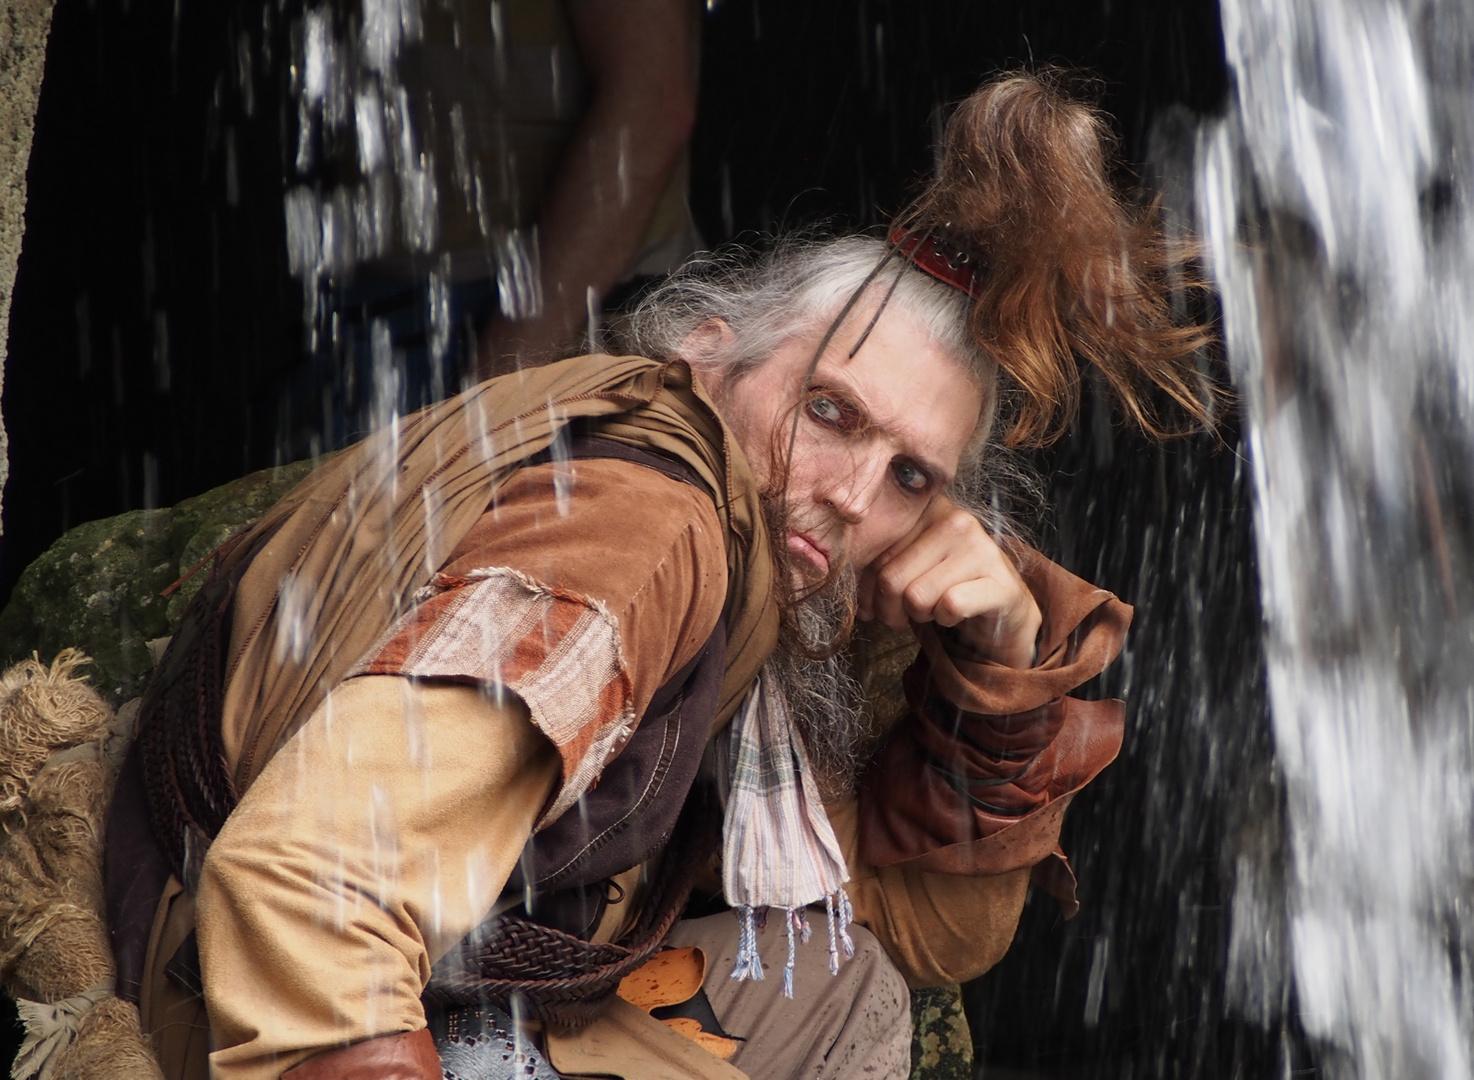 Boze man onder waterval